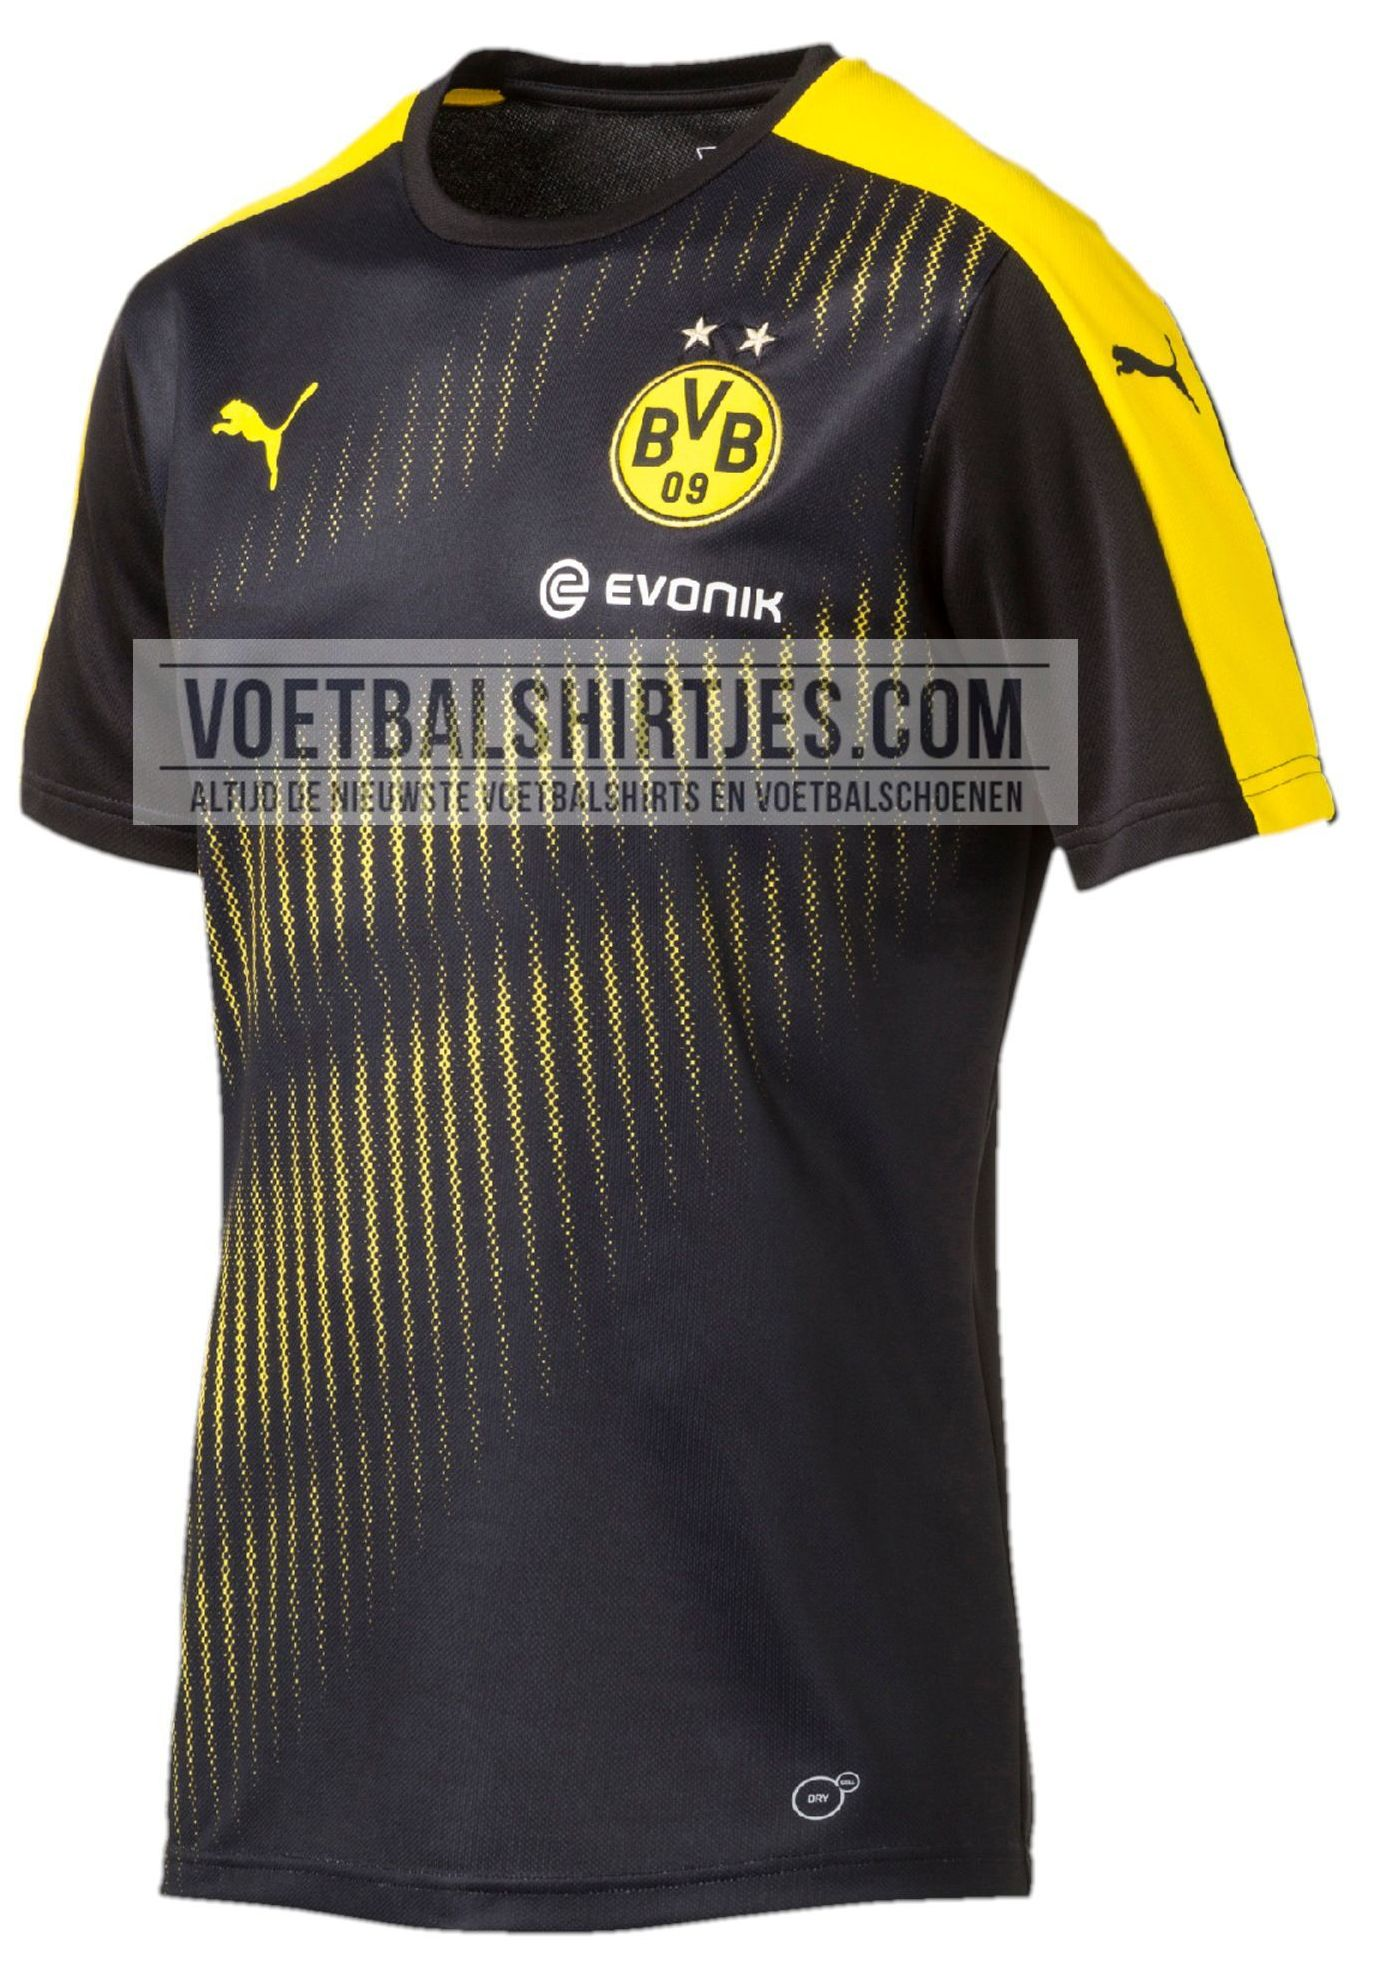 BVB training top 2017